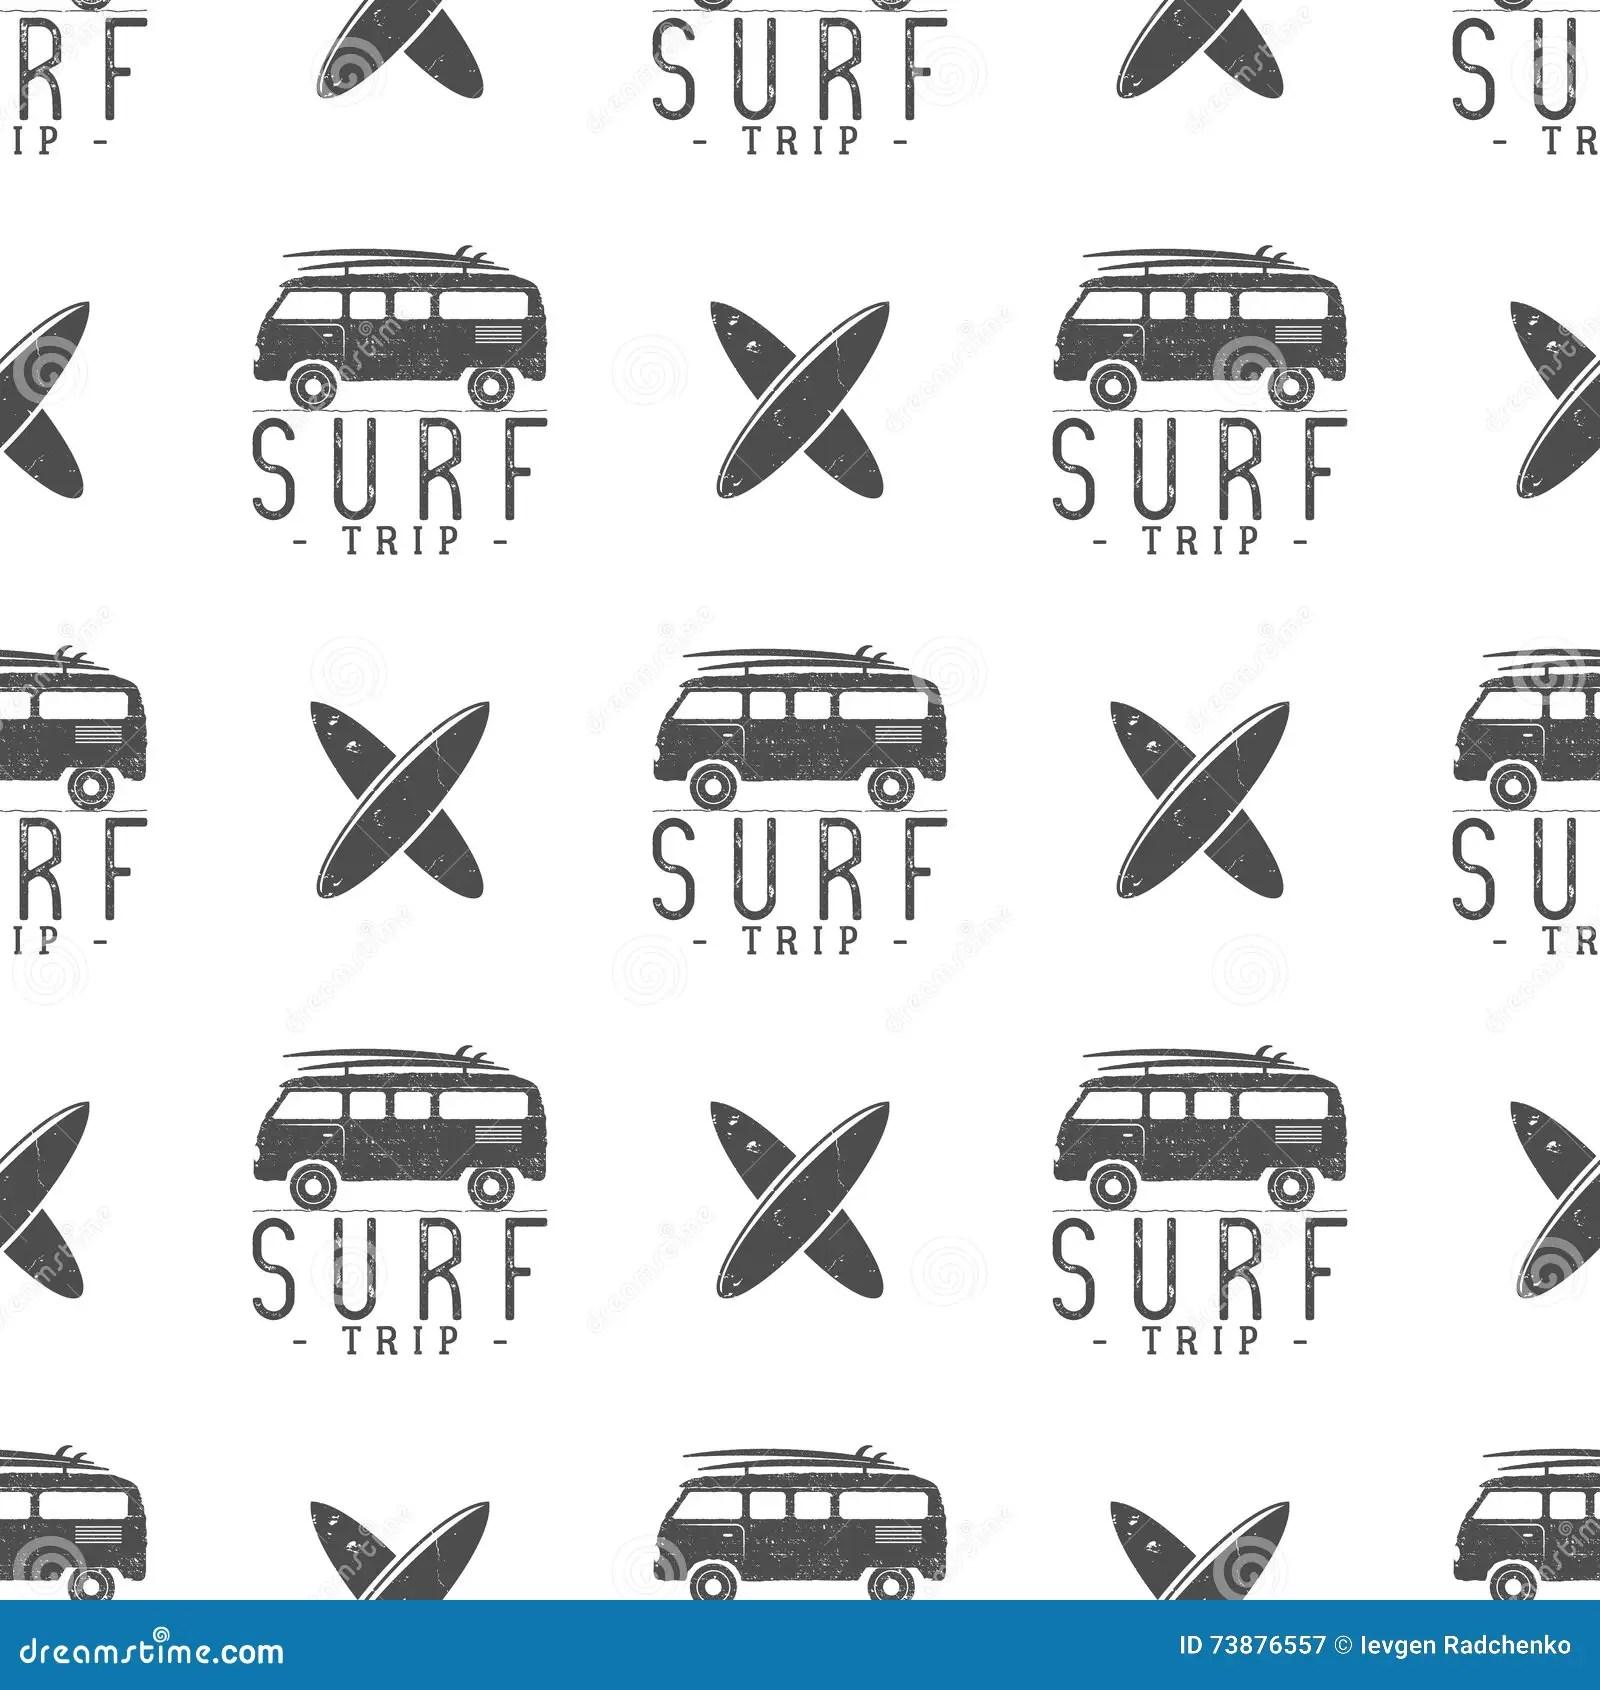 Surfing Trip Pattern Design. Summer Seamless With Surfer